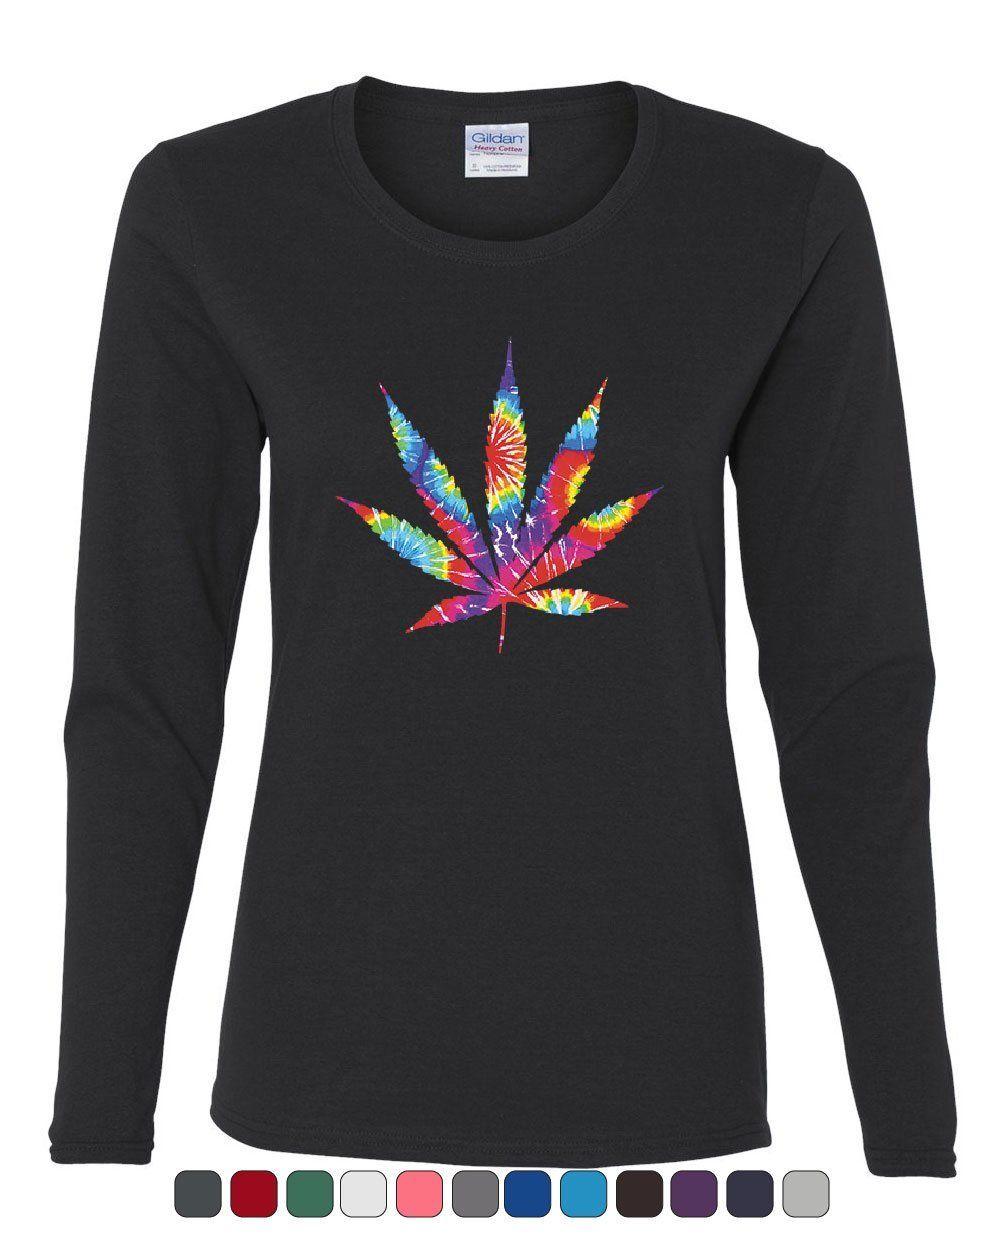 Tie Dye Pot Leaf Women's Long Sleeve Tee Smoking 420 Weed Cannabis Marijuana 1